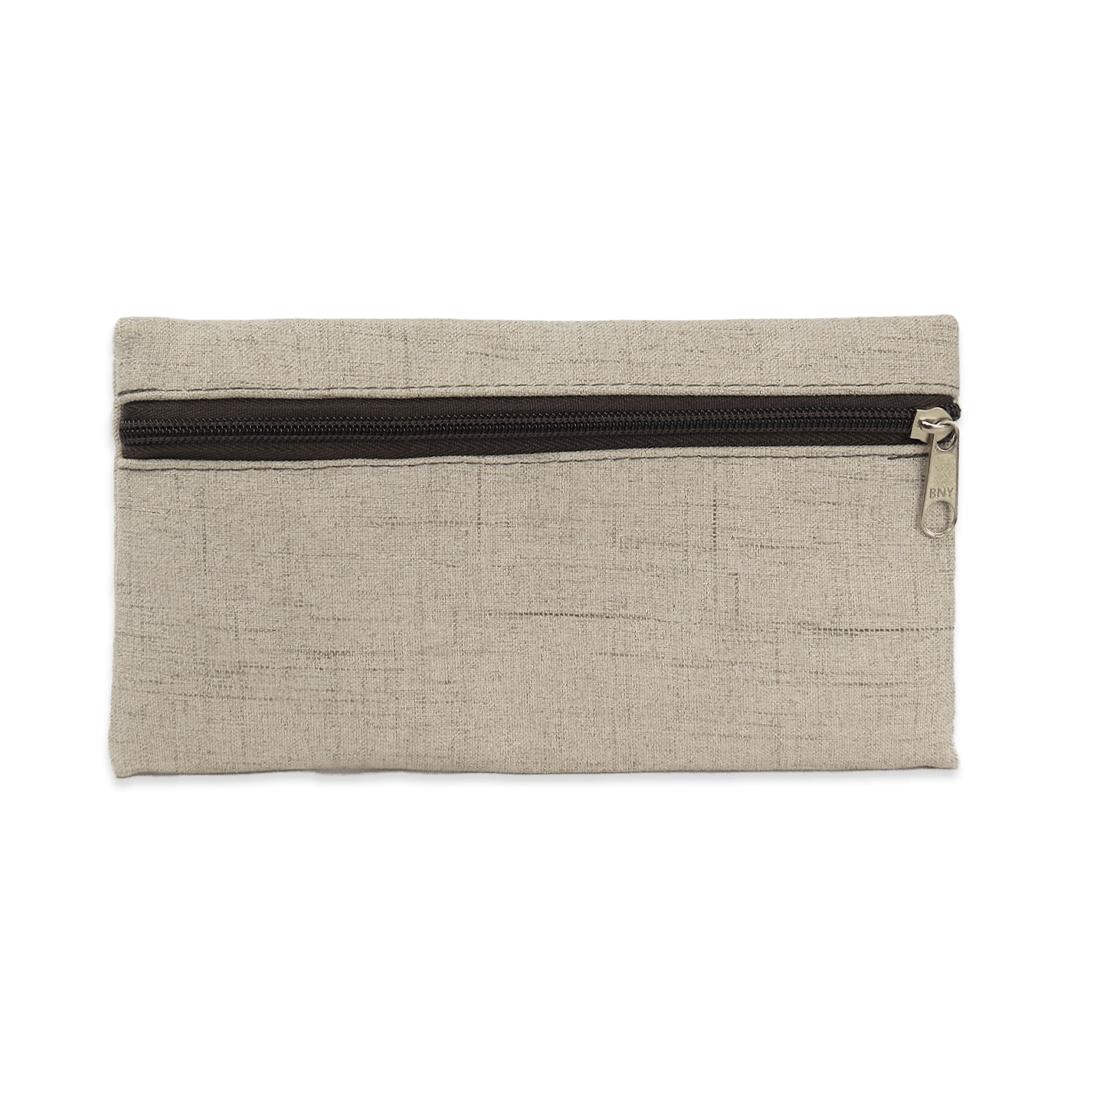 Bolsa Elétrica Voilà! Bag - Cosmopolitan Natural